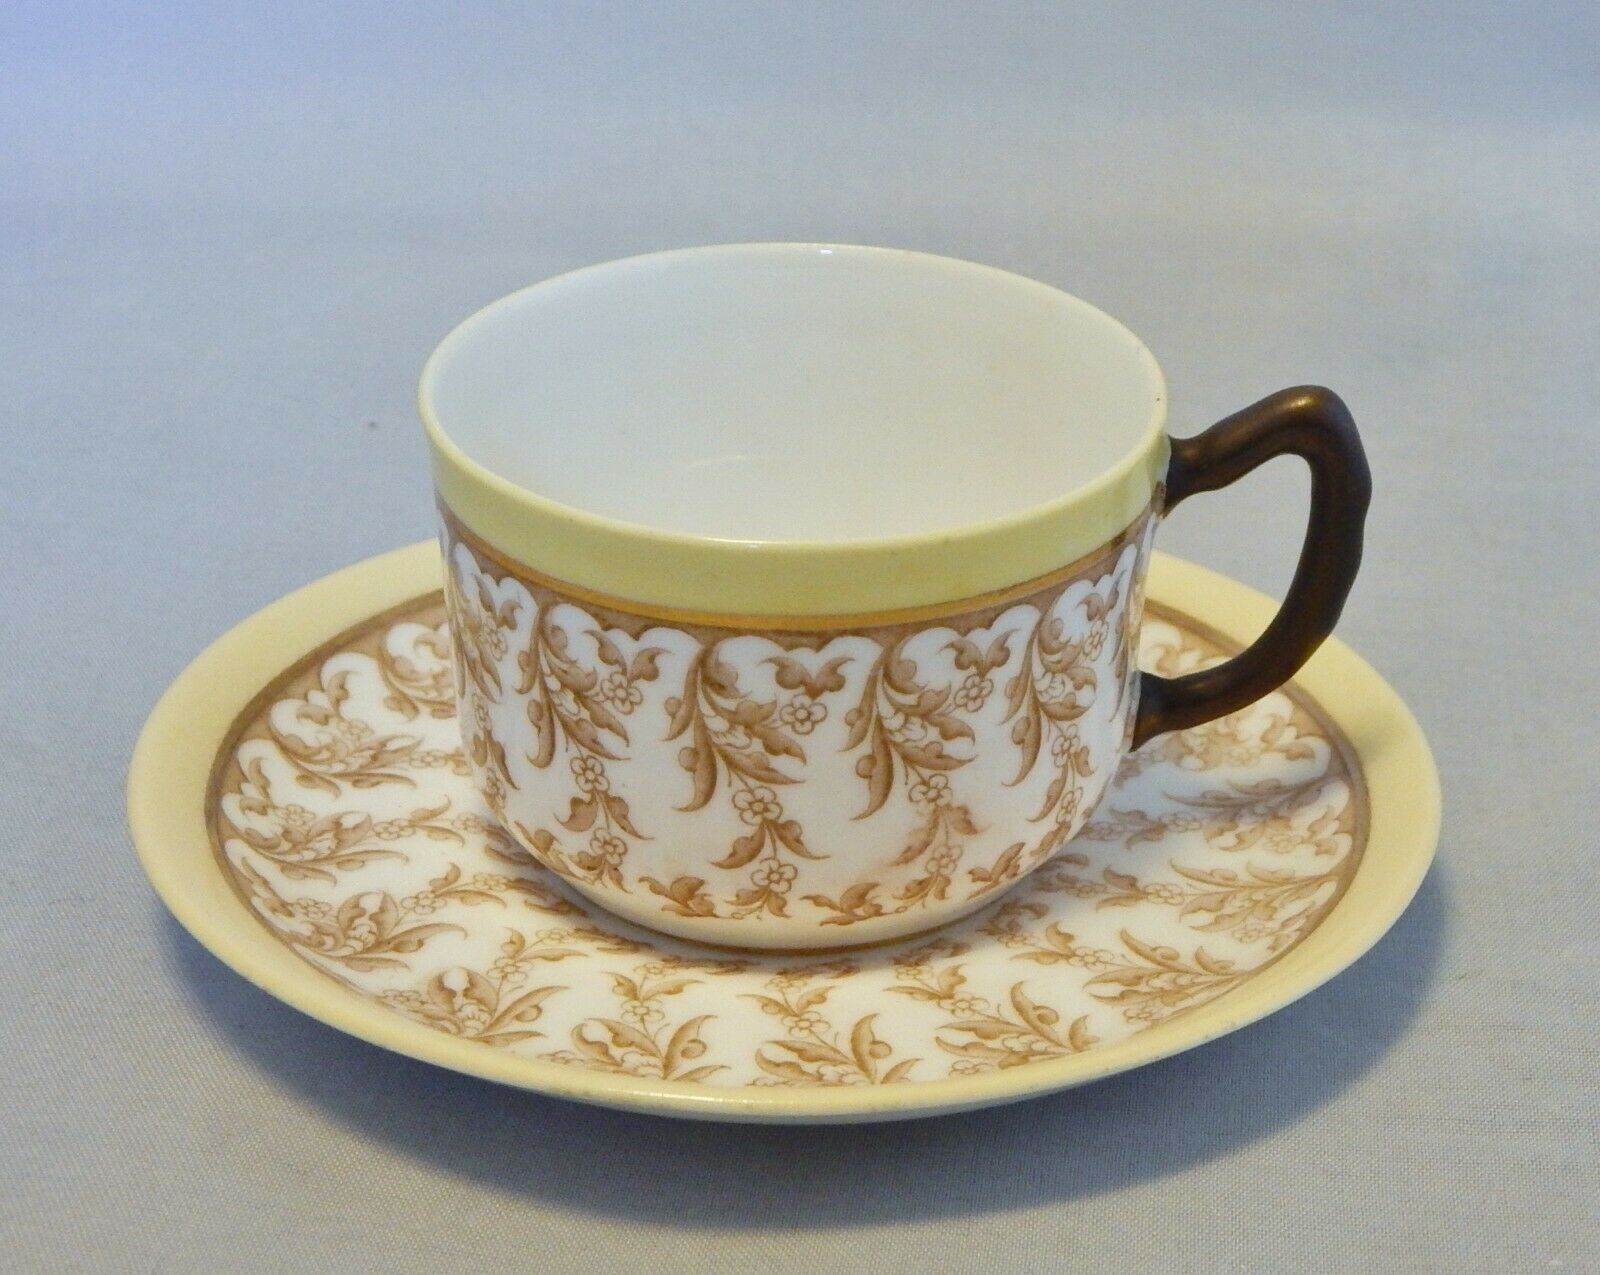 Antique 1888 Royal Worcester Demitasse Cup and Saucer Set